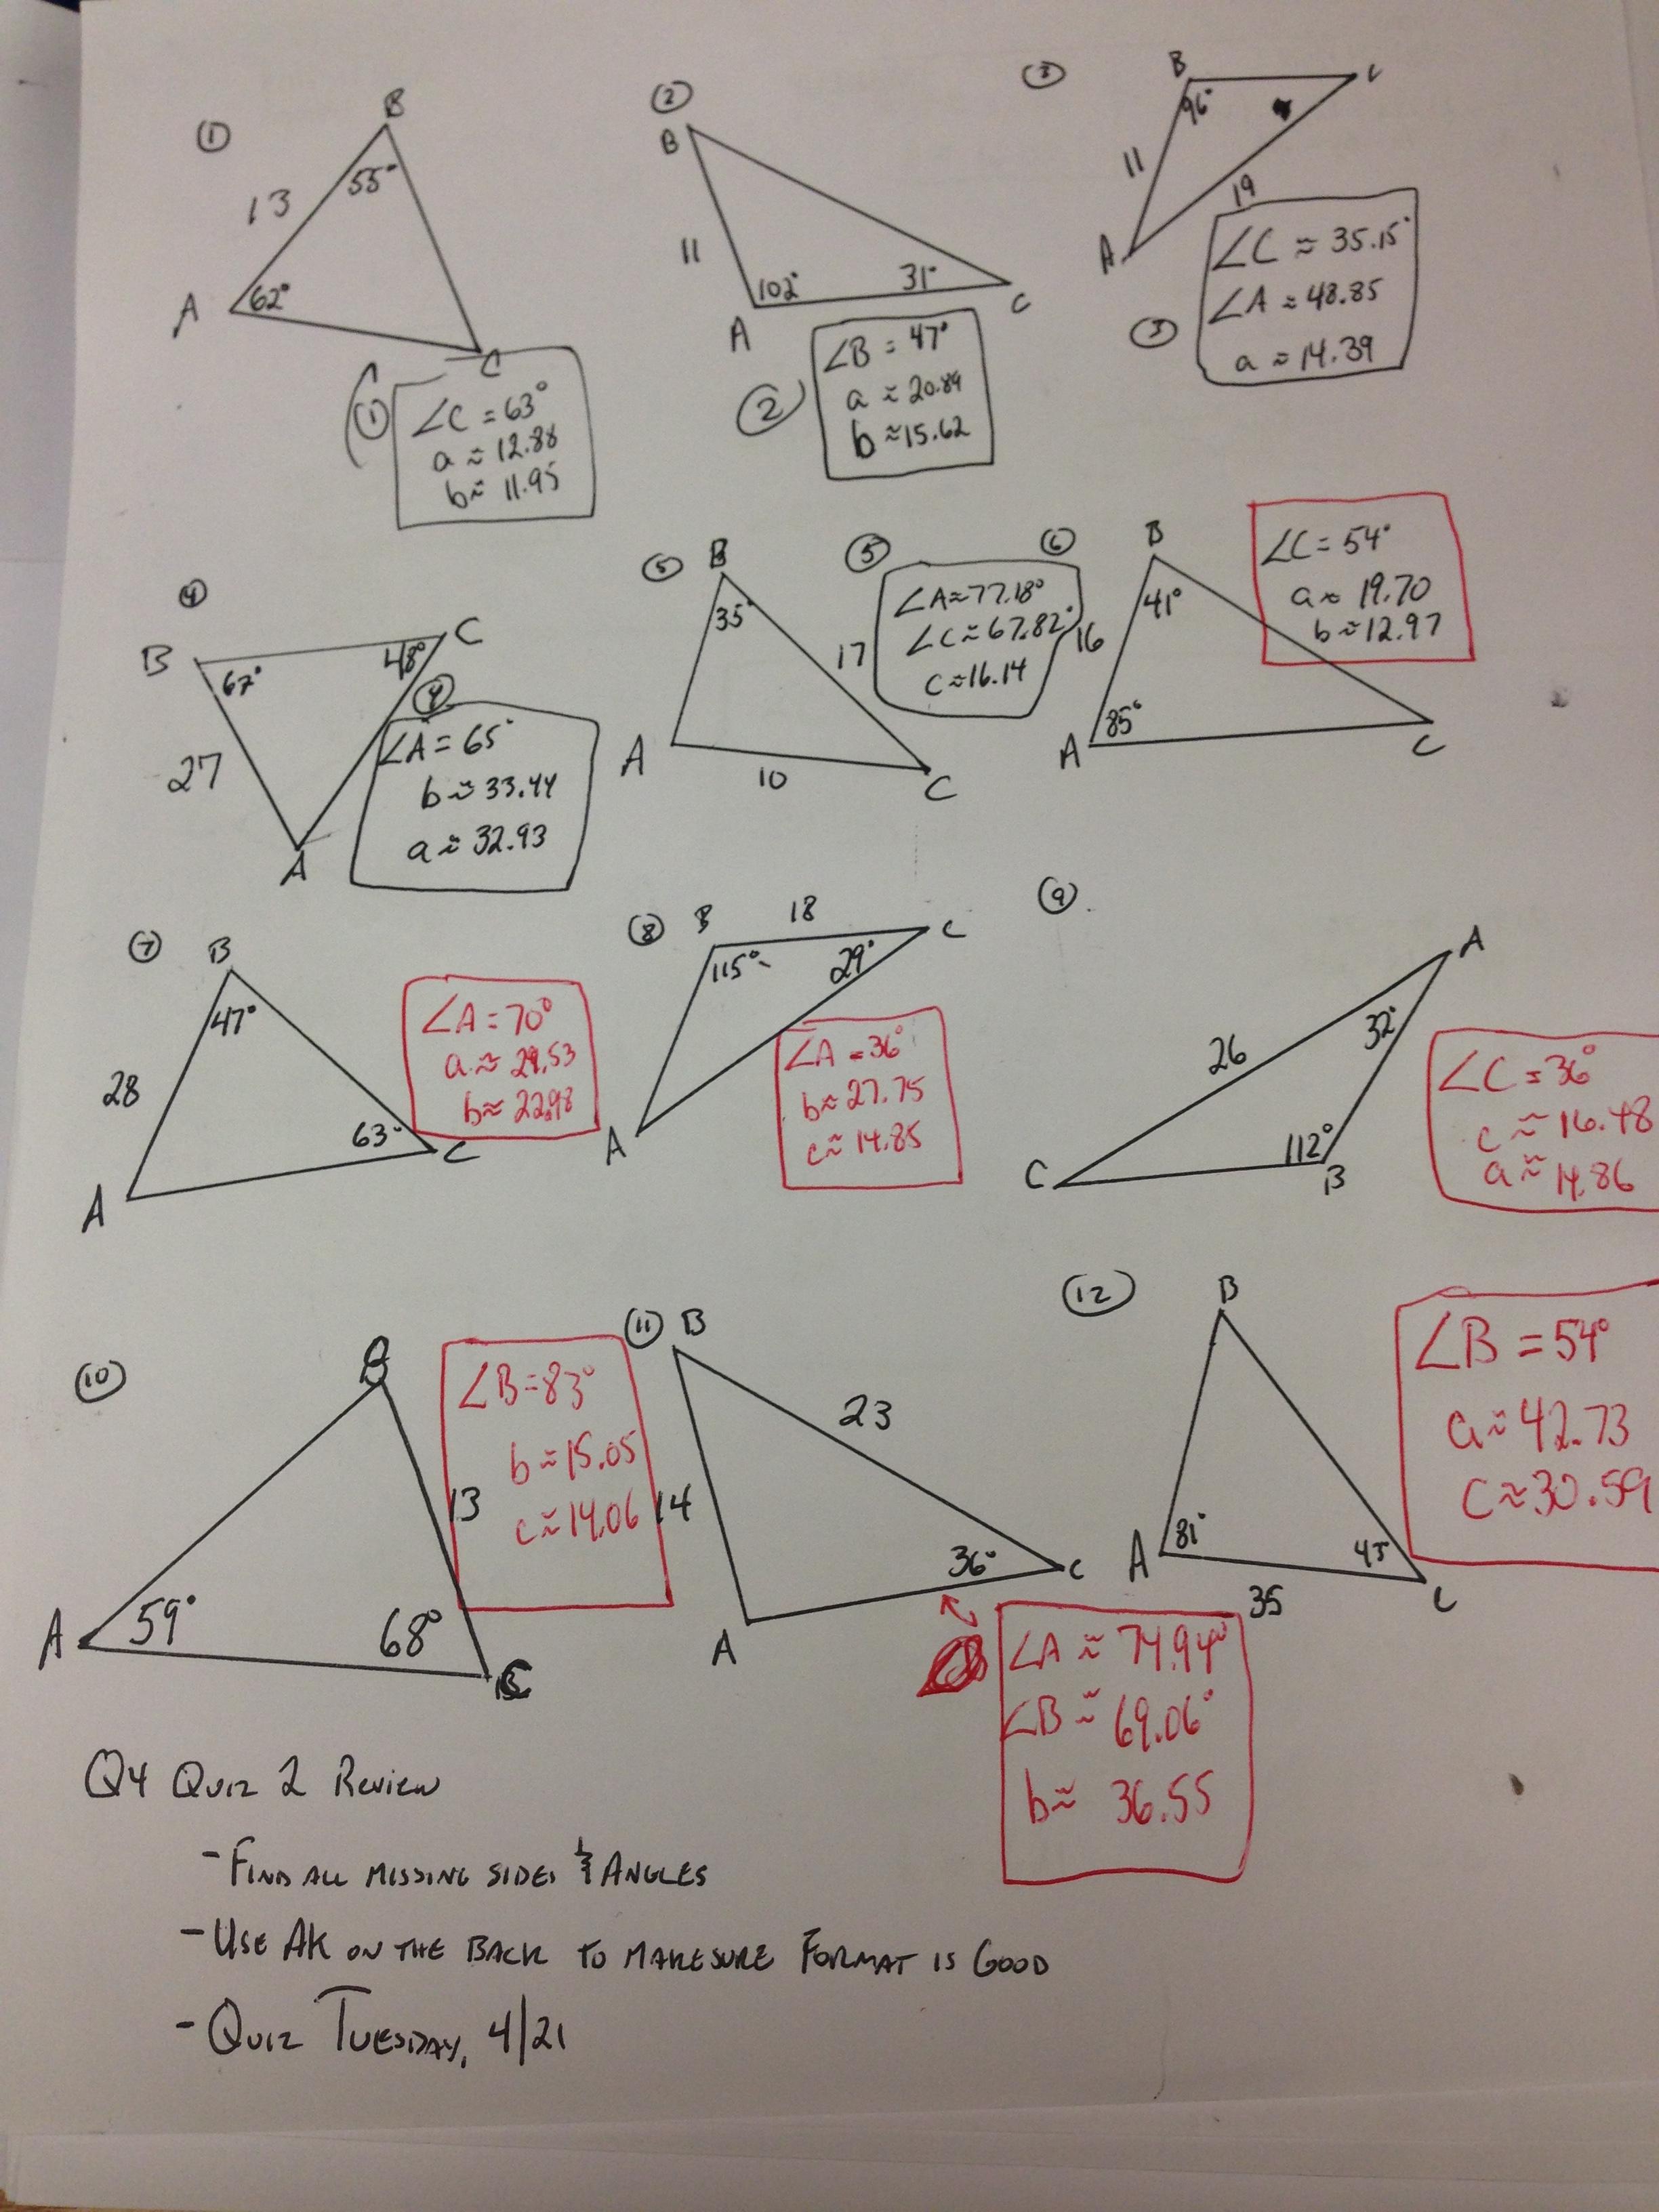 worksheet Law Of Cosines Worksheet Doc www sfponline org uploads76 8142017 530 pm 133803 alg2a q4 quiz 2 review law of cosines pdf 1782628 3 answer key jpg 1271033 alg2a